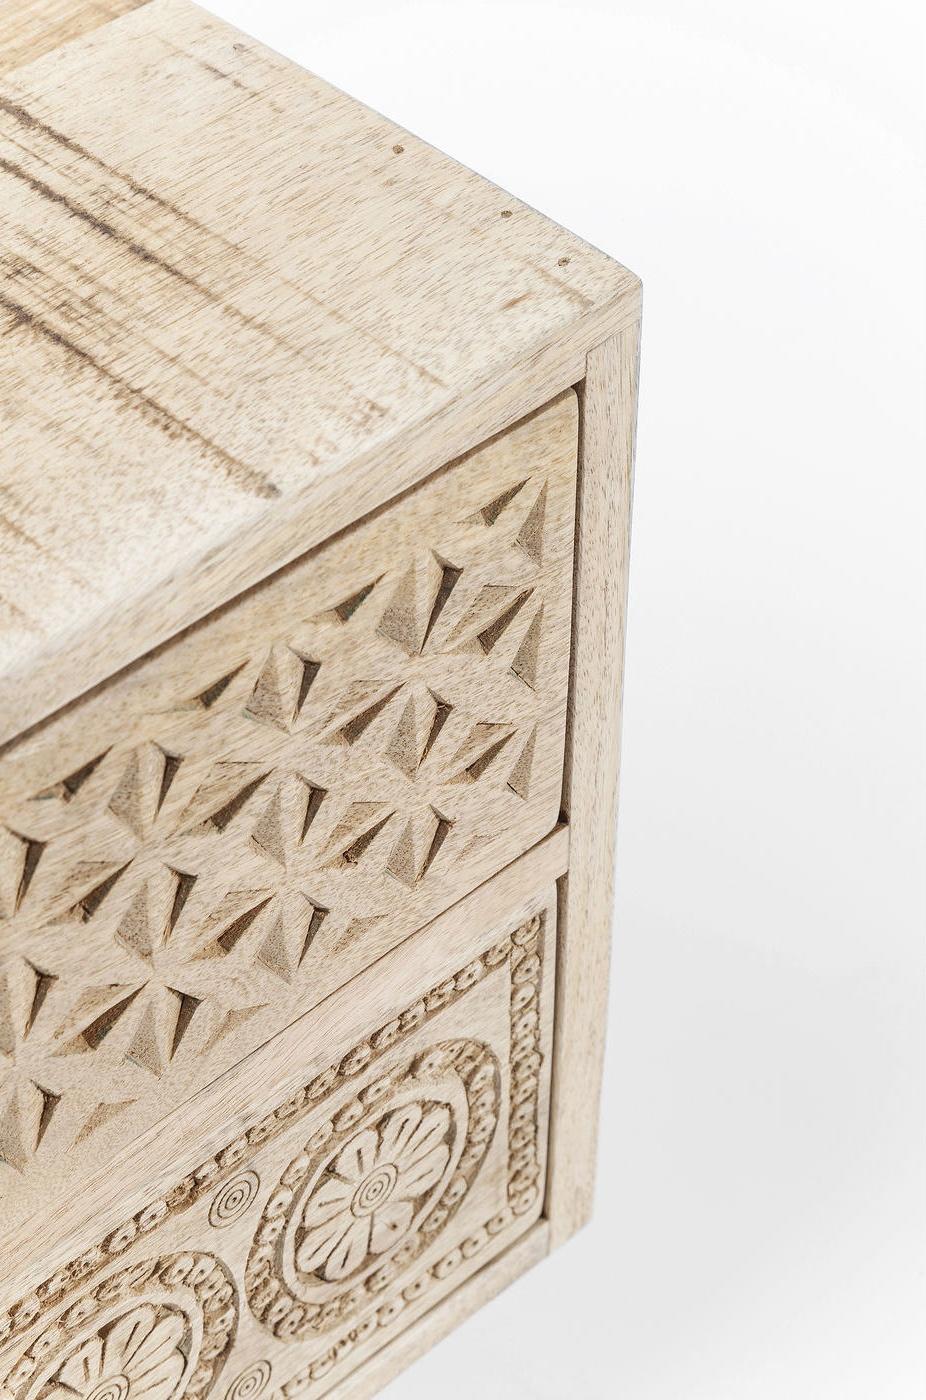 Kare Design Ladekast Puro - 2 Laden - L50 X B35 X H46 Cm - Mangohout